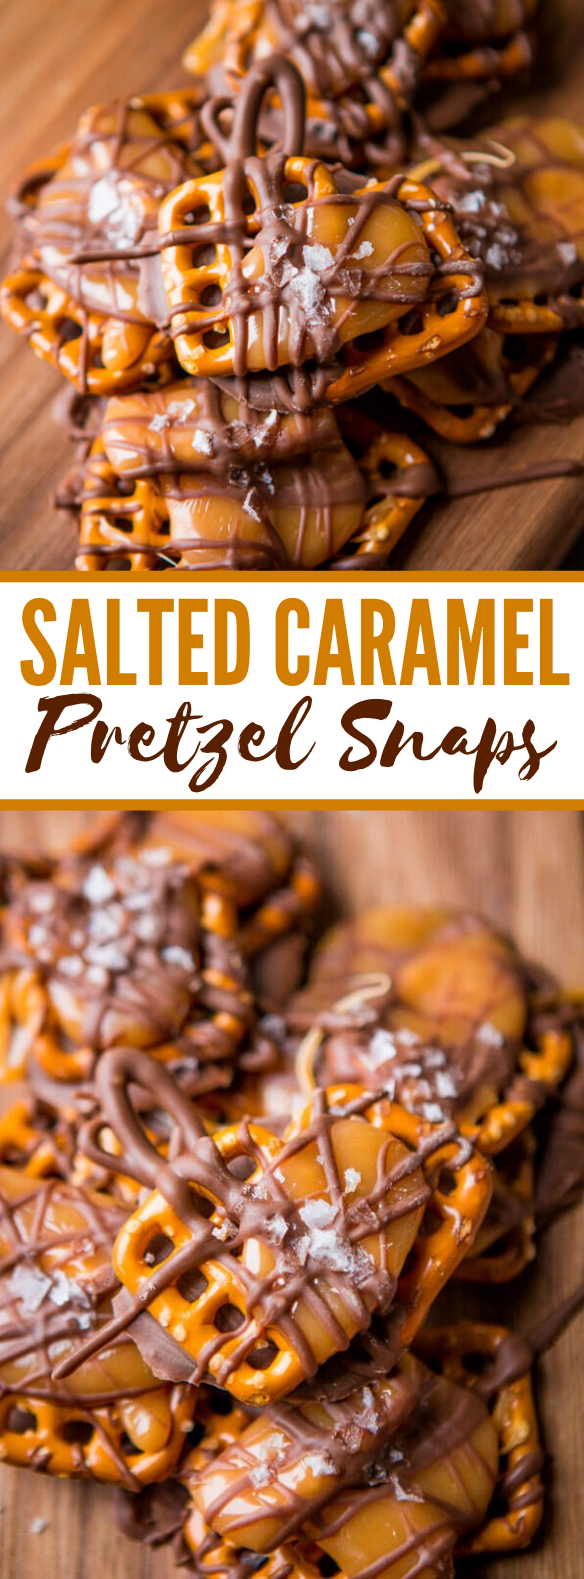 Salted Caramel Pretzel Snaps #desserts #chocolate